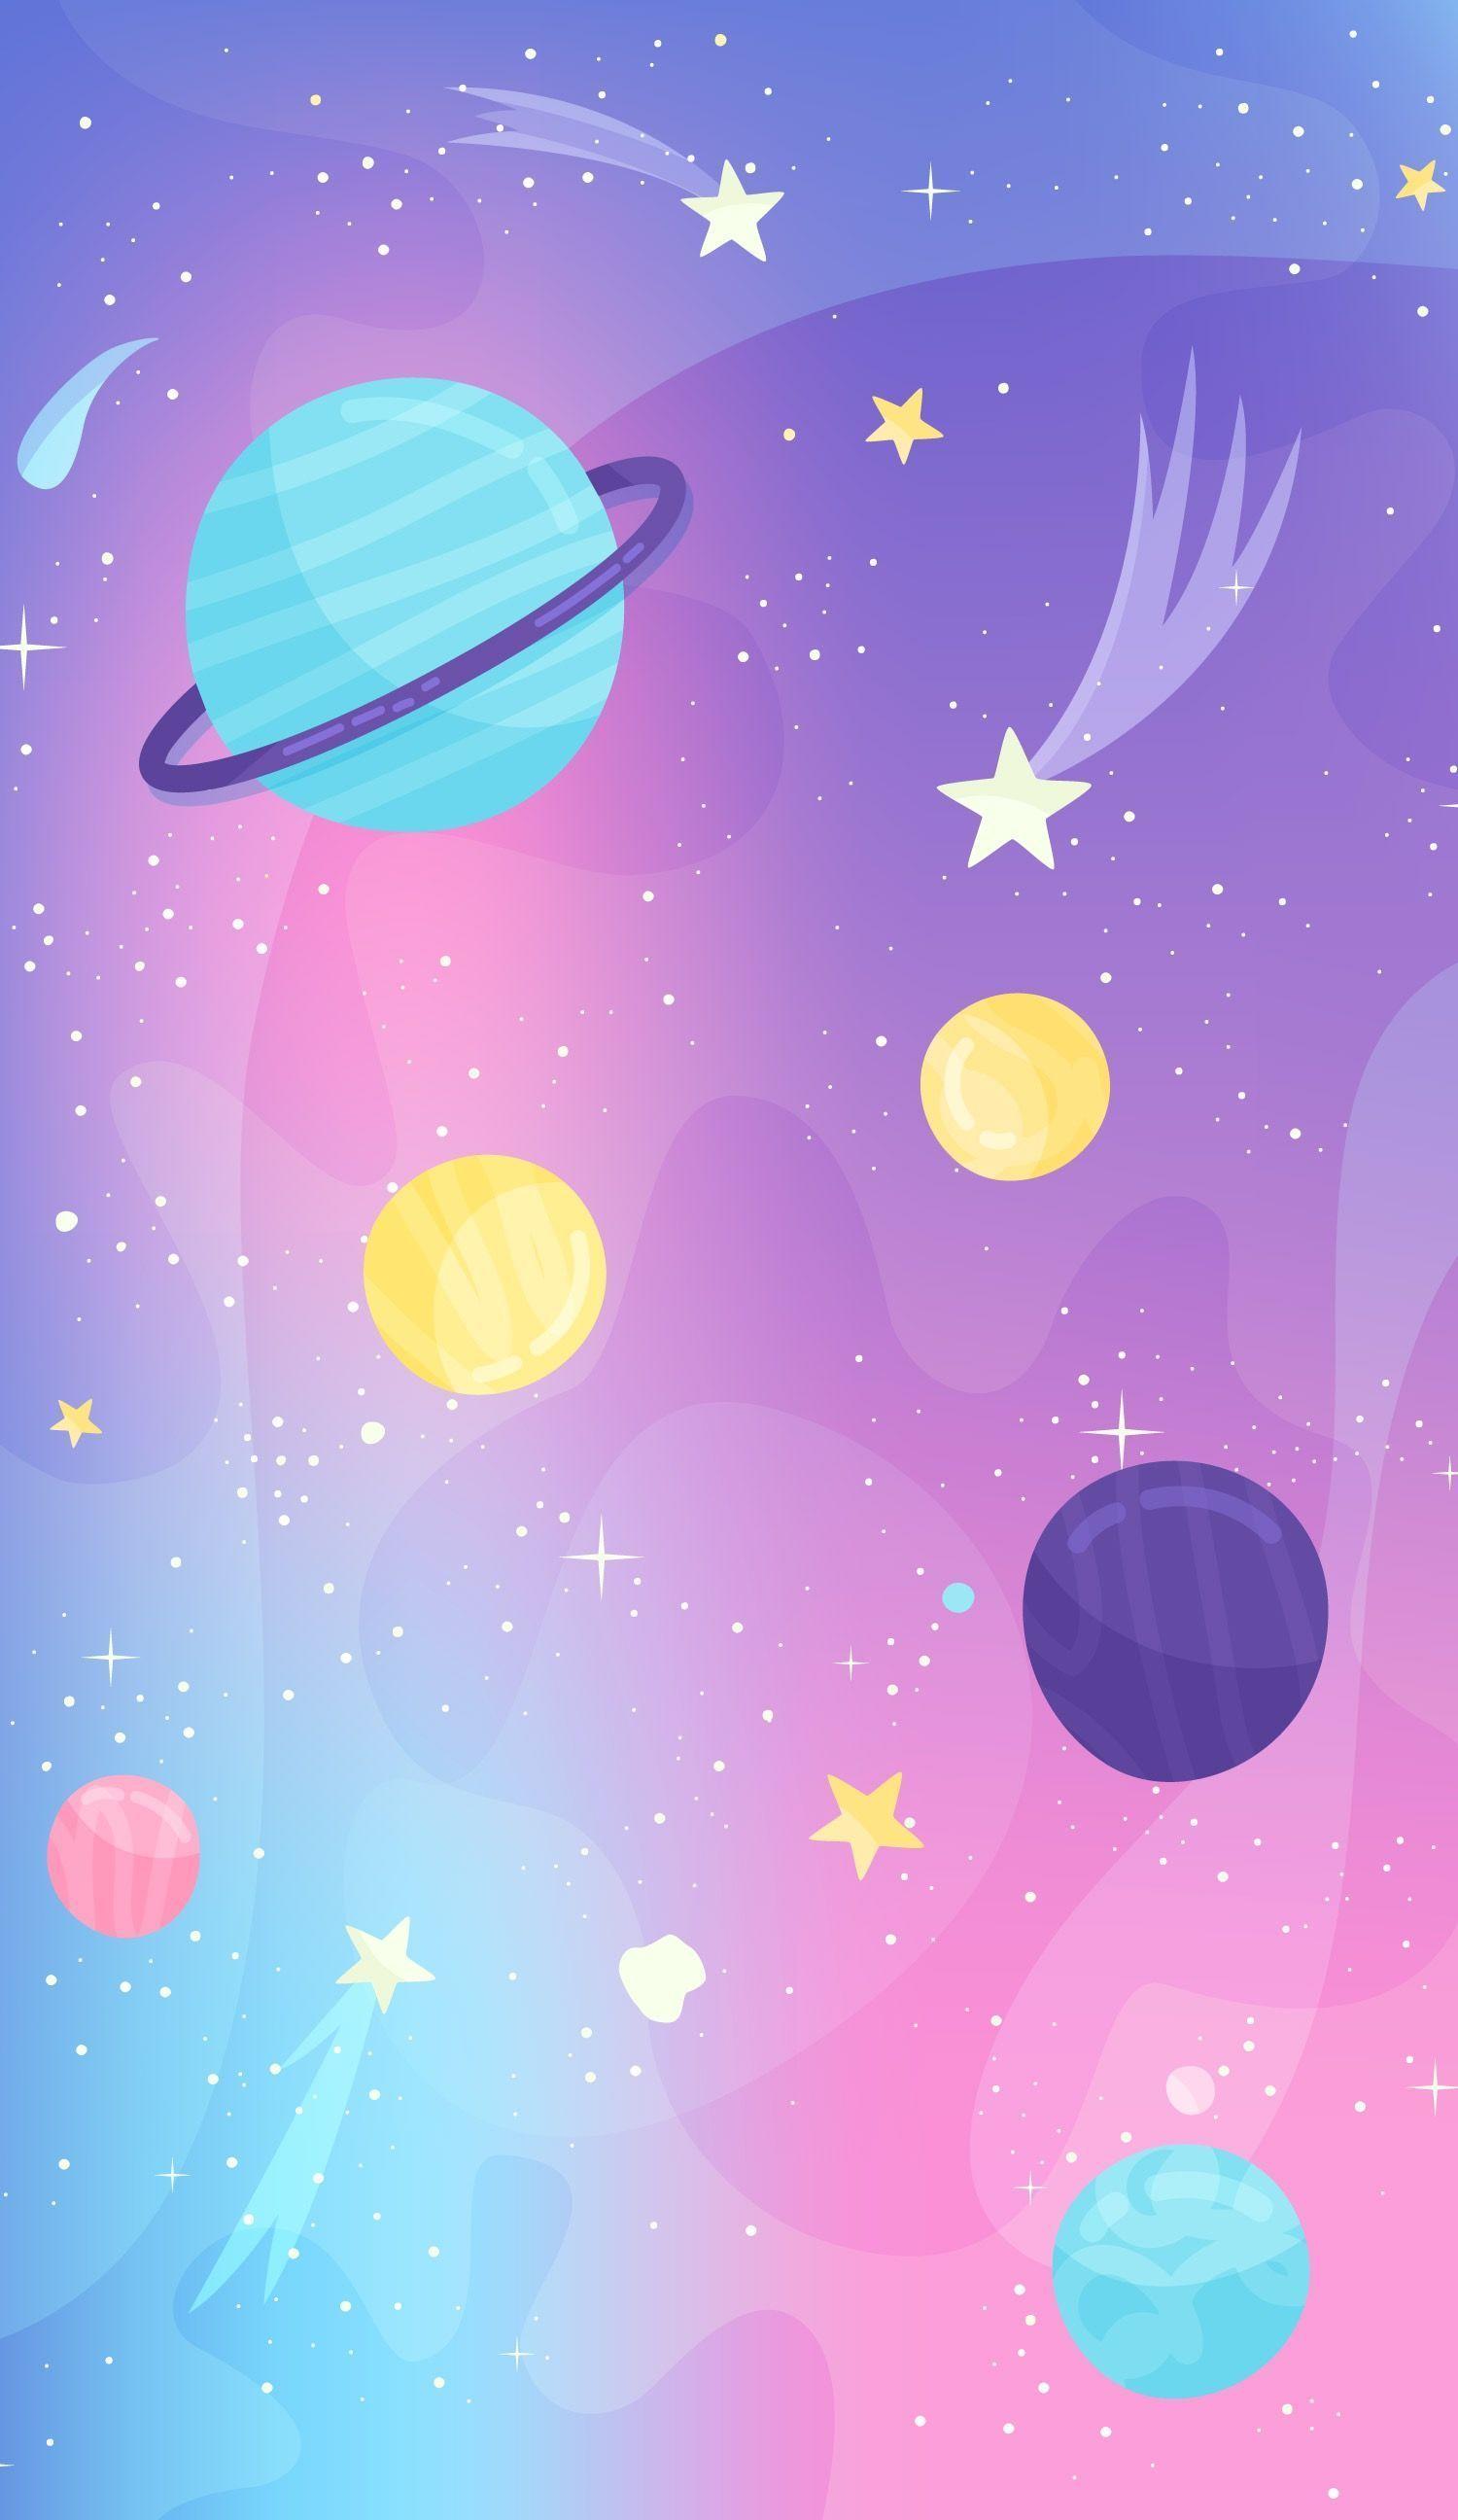 Planetes Kawaii 3 Cute Galaxy Wallpaper Galaxy Wallpaper Space Phone Wallpaper